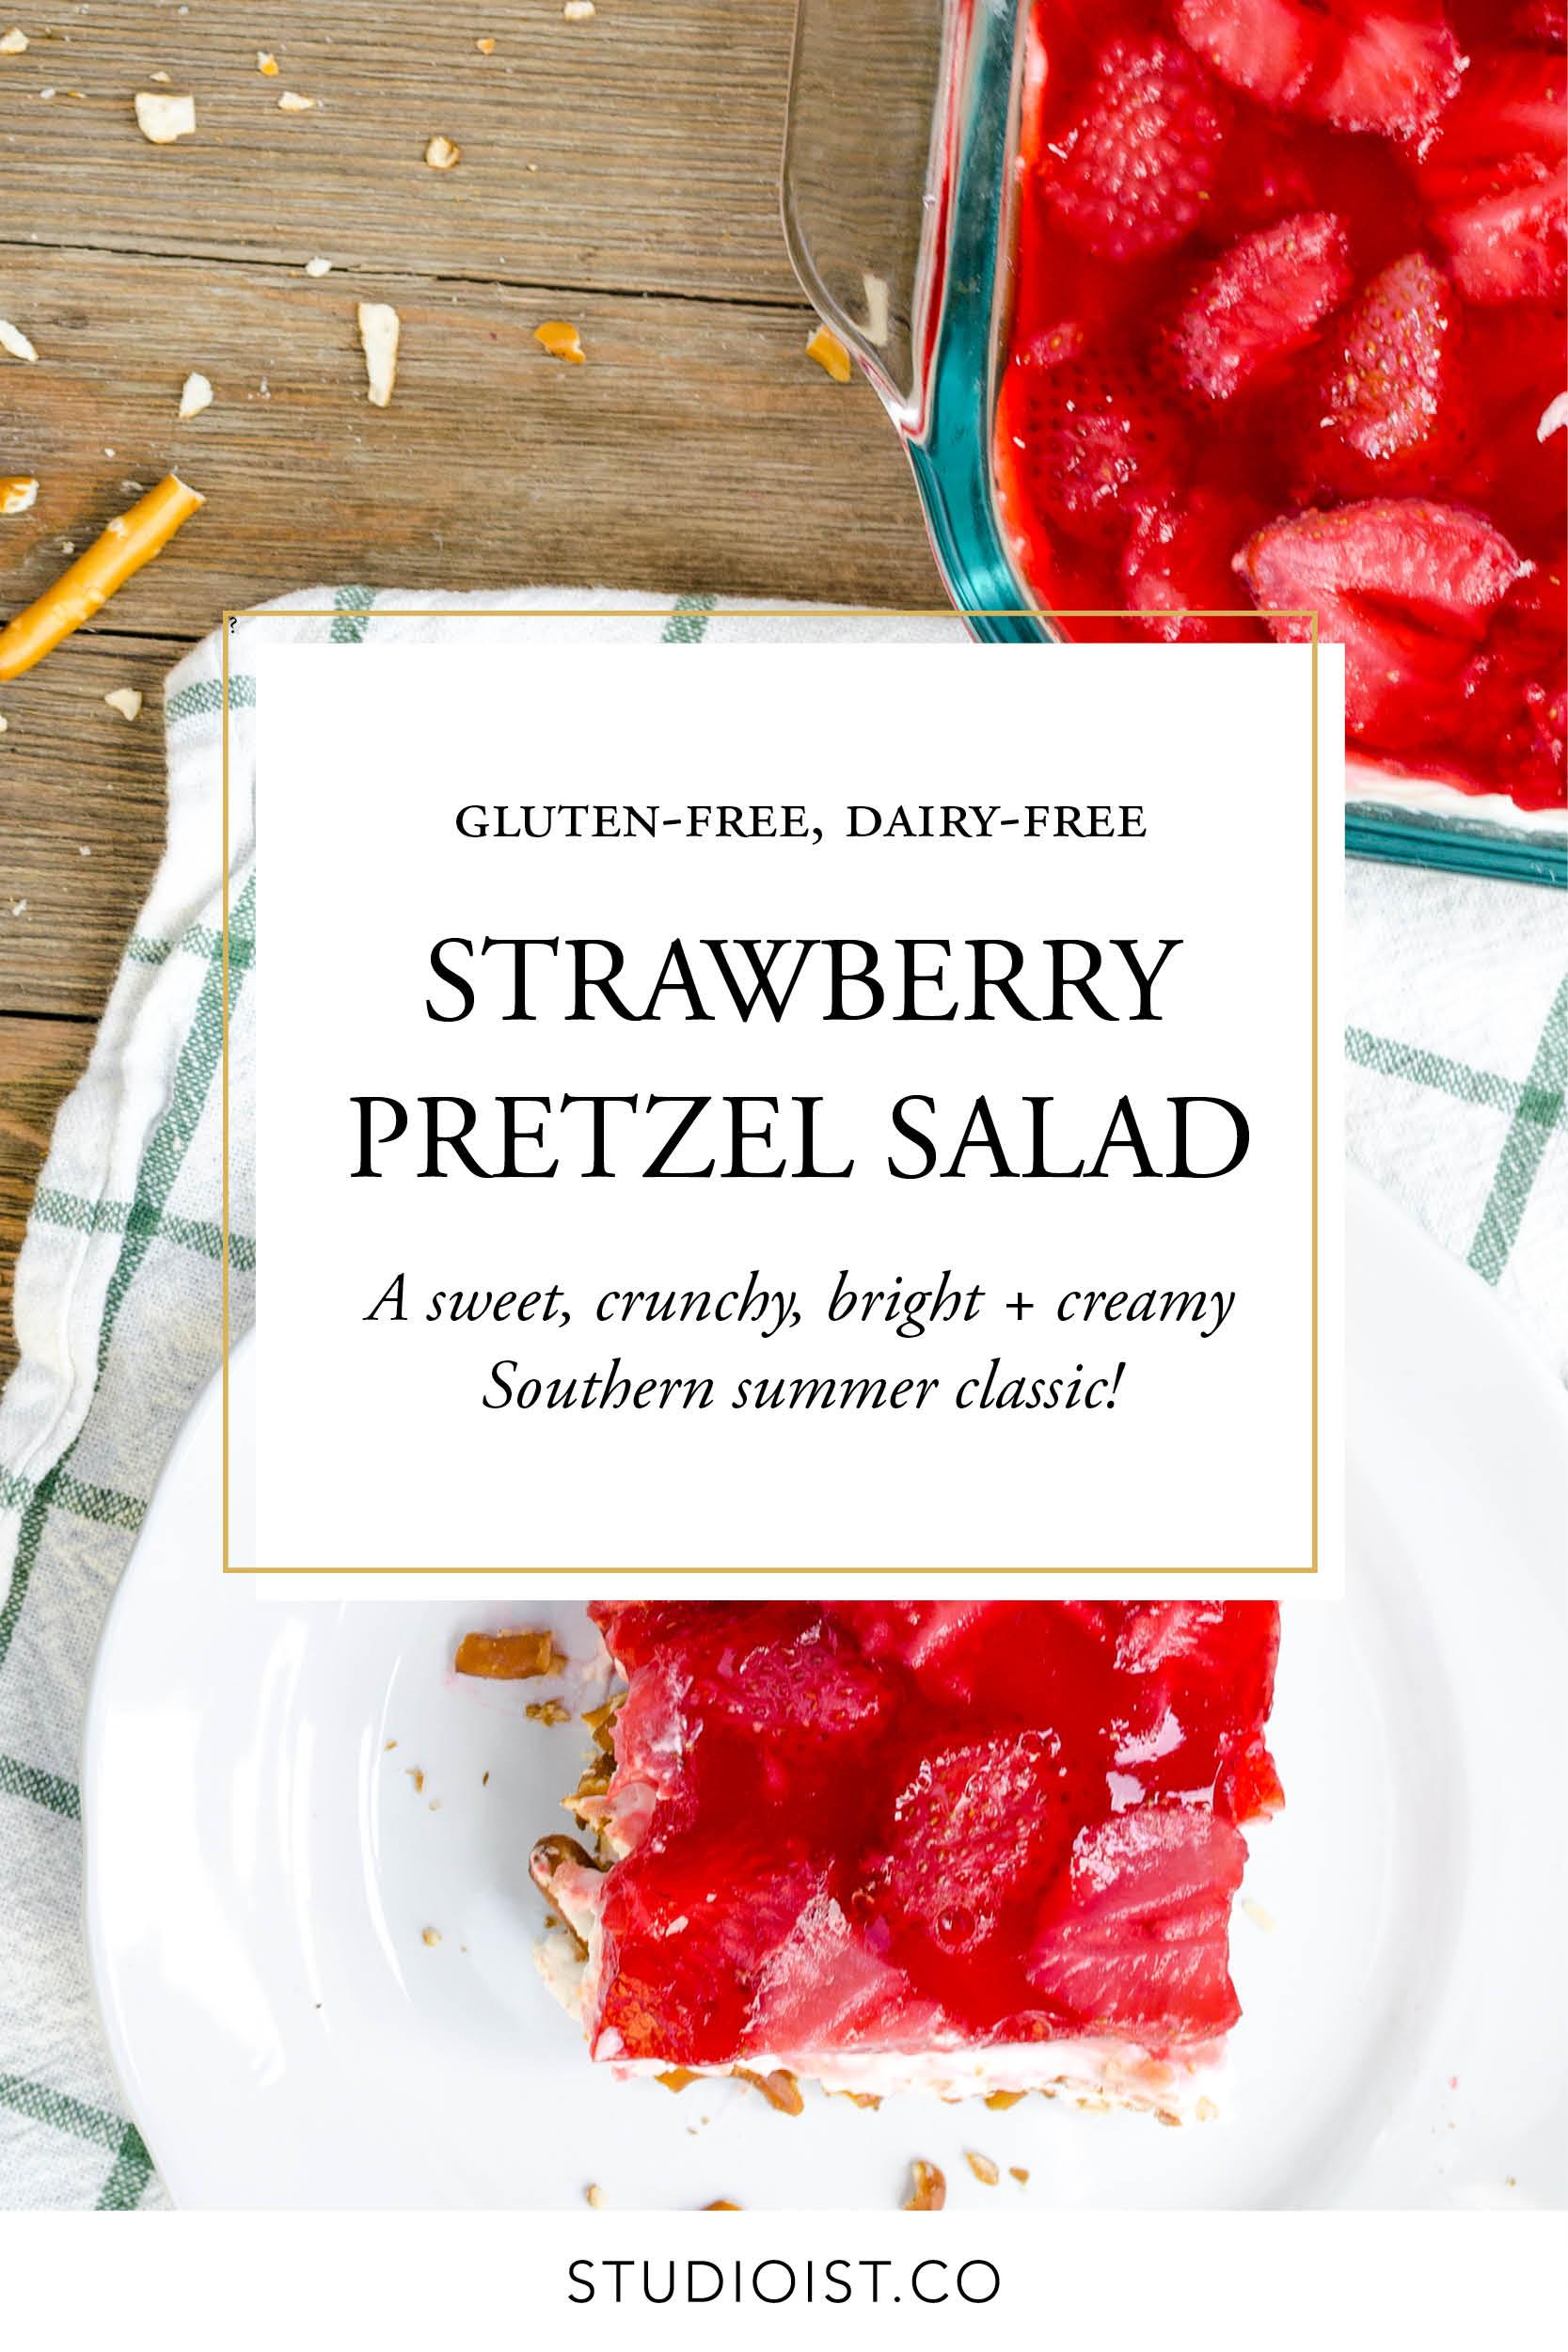 Studioist_Pinterest Design_Pretzel Salad.jpg